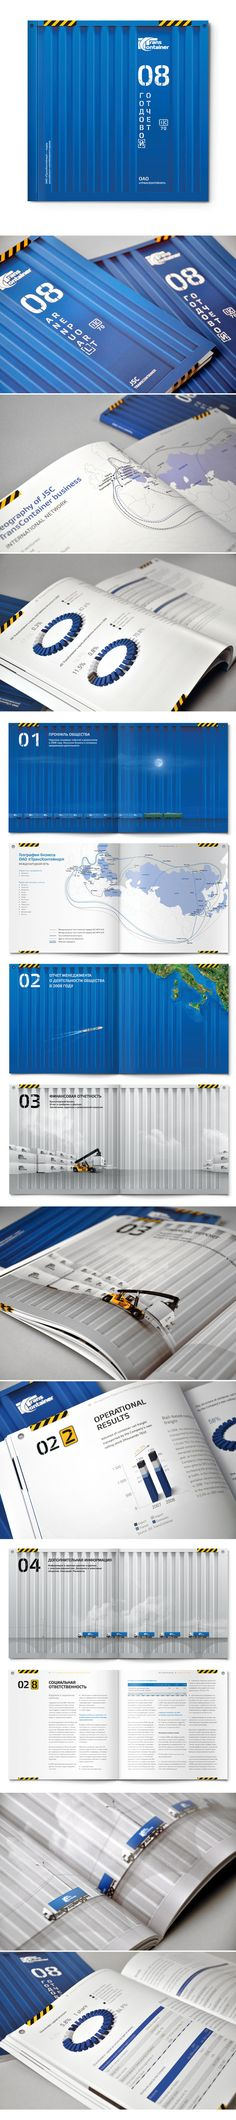 Transcontainer Annual Report